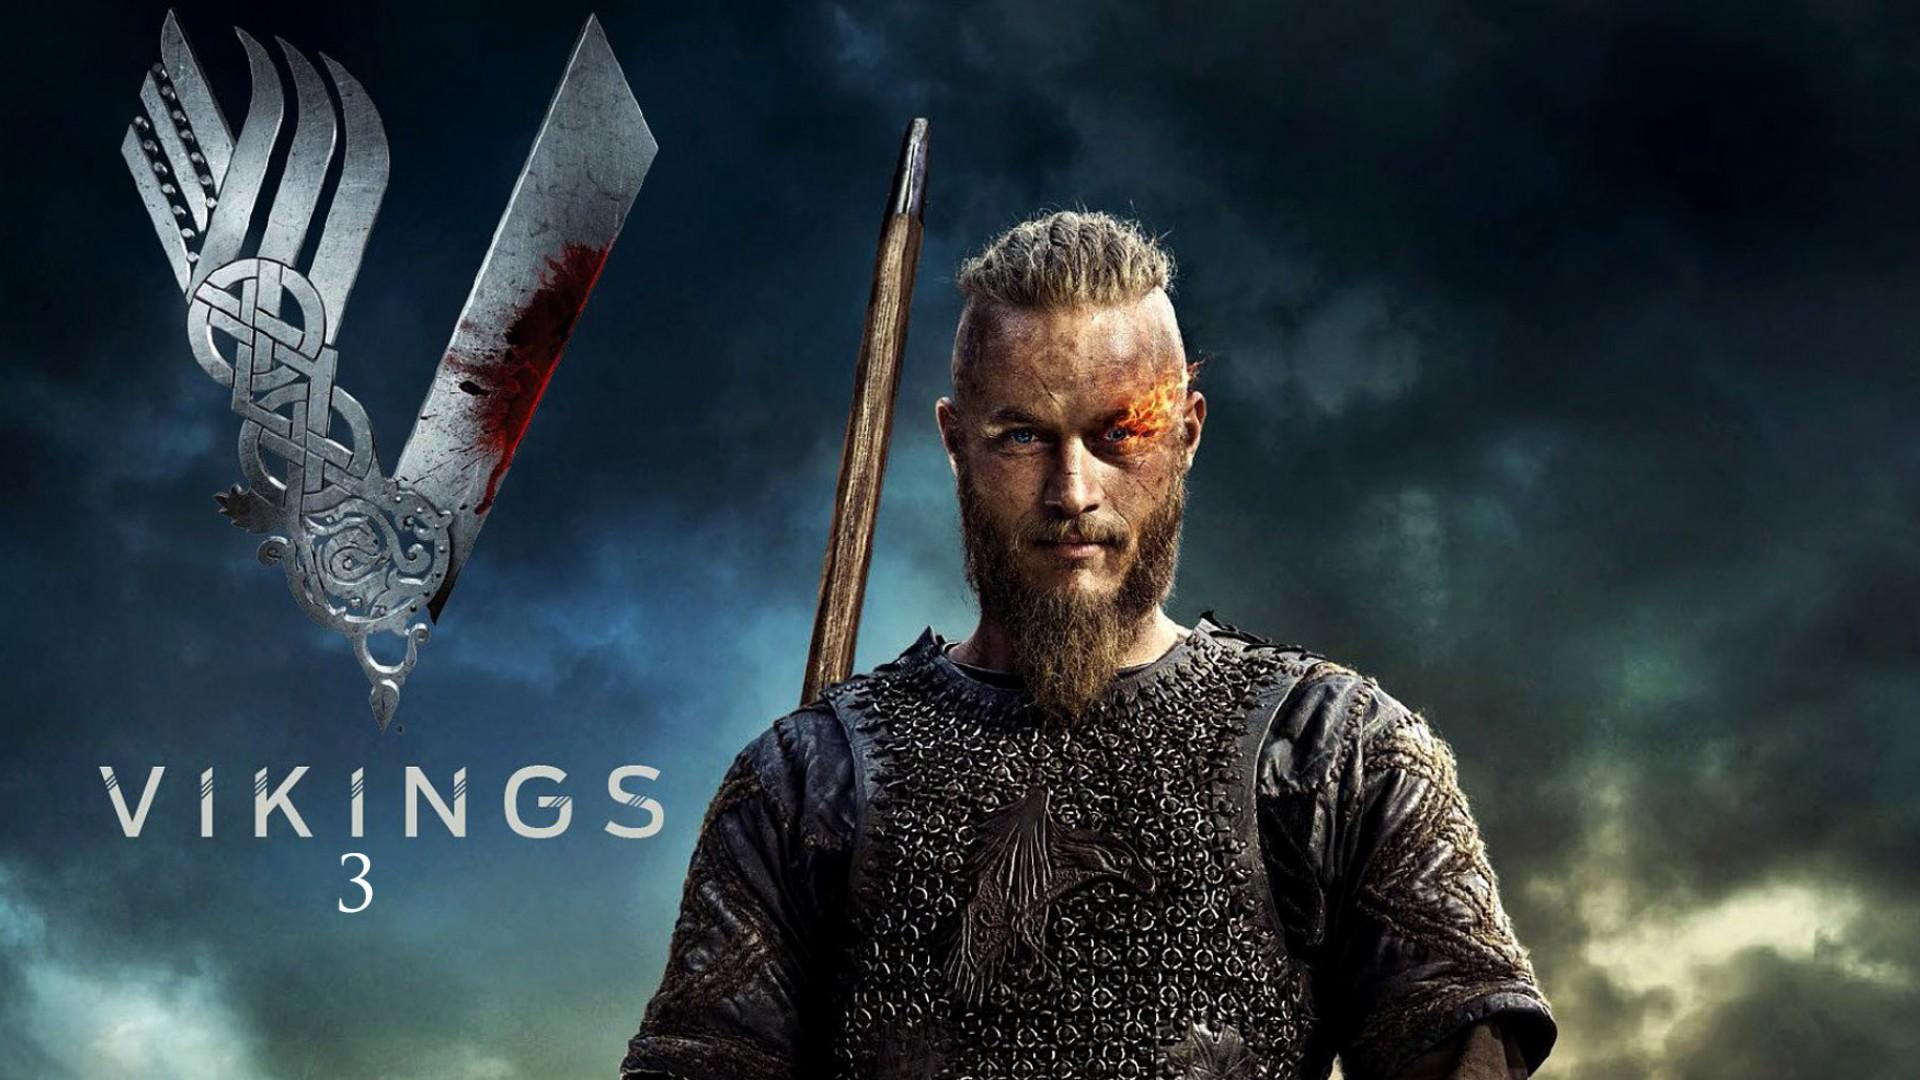 Download Ragnar Lothbrok In Vikings 3 Tv Series HD Wallpaper Search 1920x1080